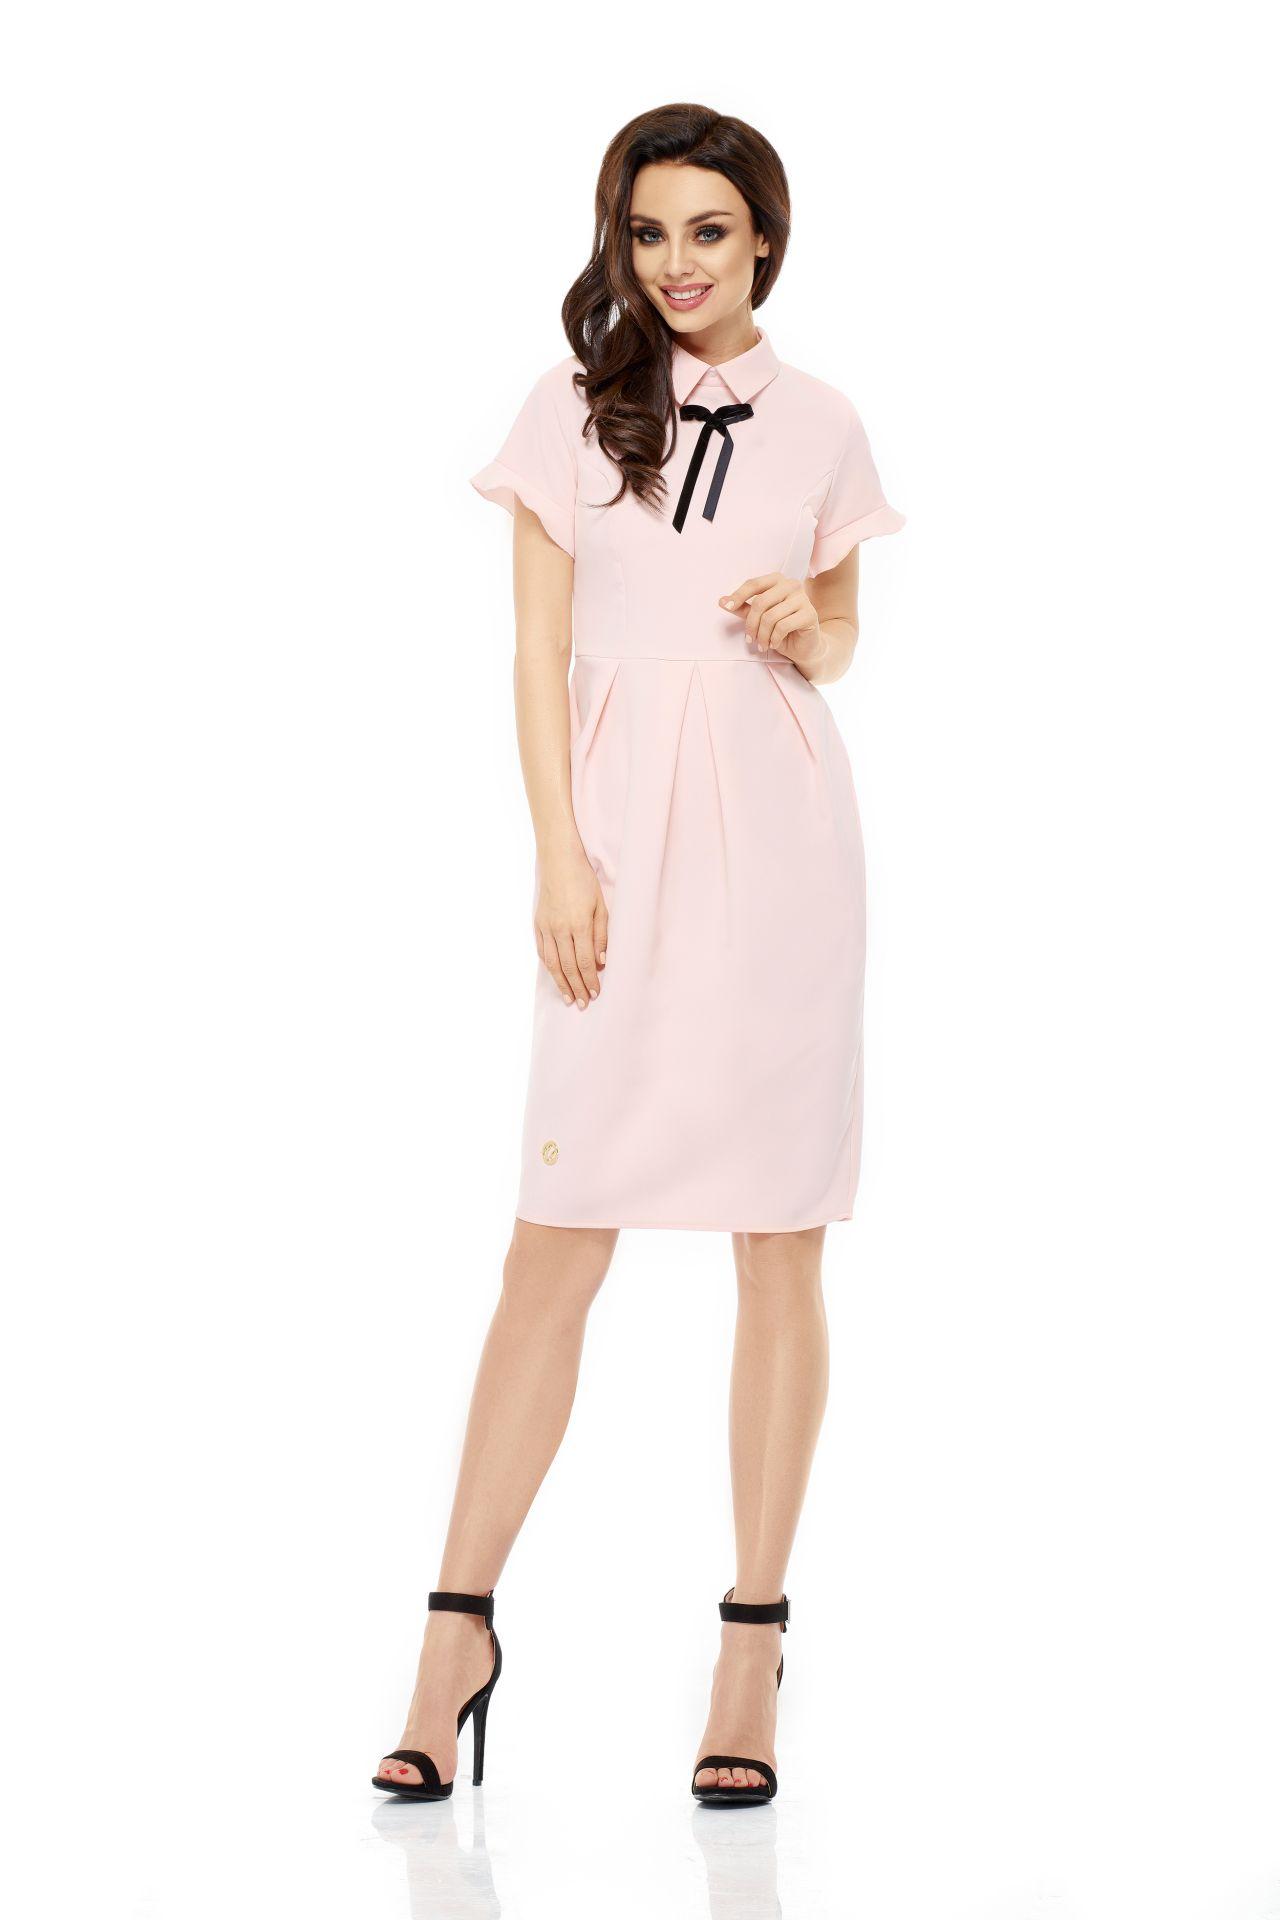 a3134a45bd Modna elegancka sukienka - LEMONIADE!! 42XL - 7650116310 - oficjalne ...